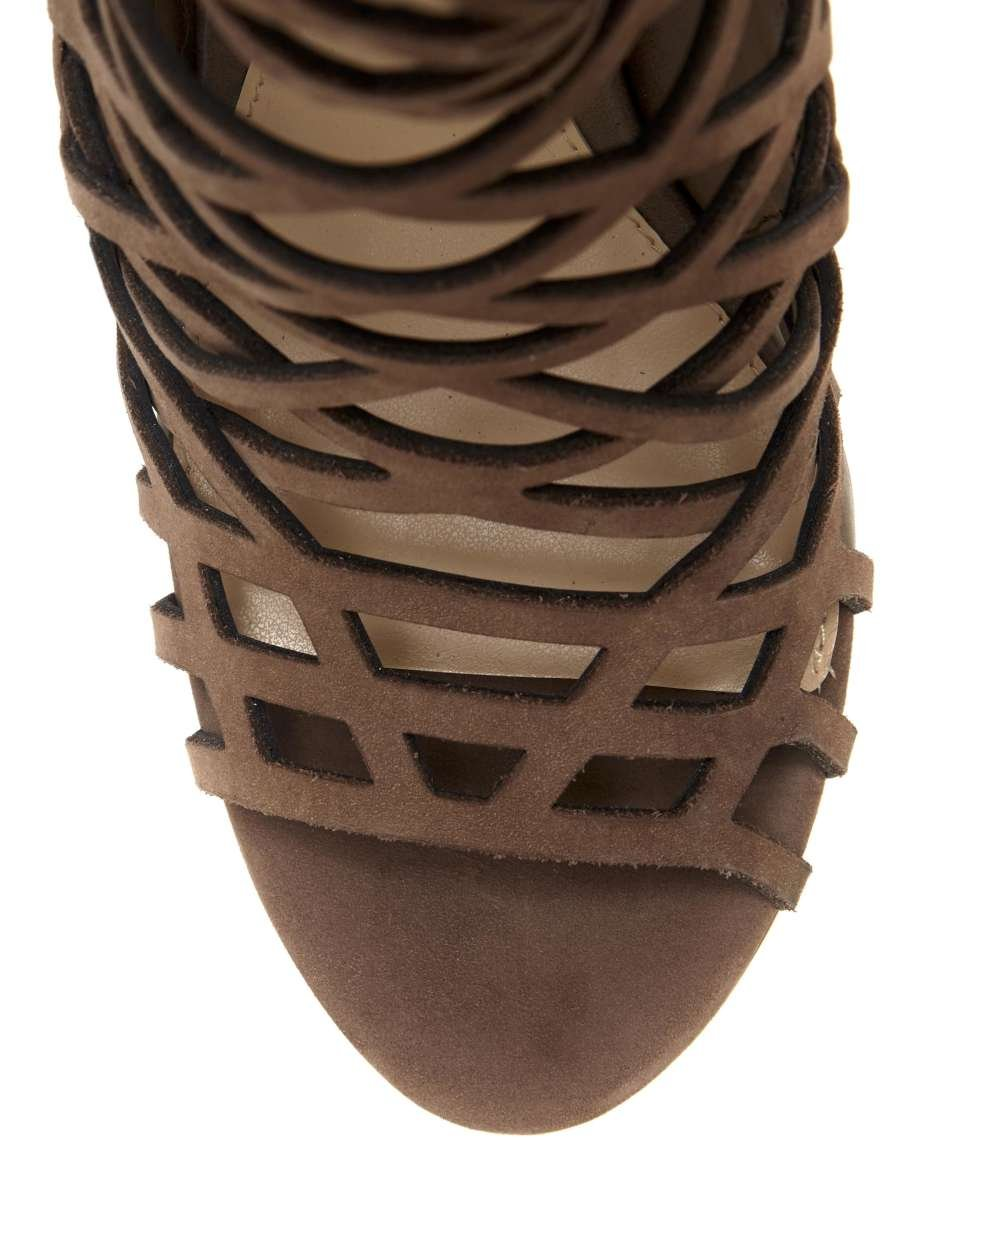 Vince Camuto Women's Keliana Knee High Boot B07D74H29K 5.5 B(M) US|Double Shot Soft Nubuck